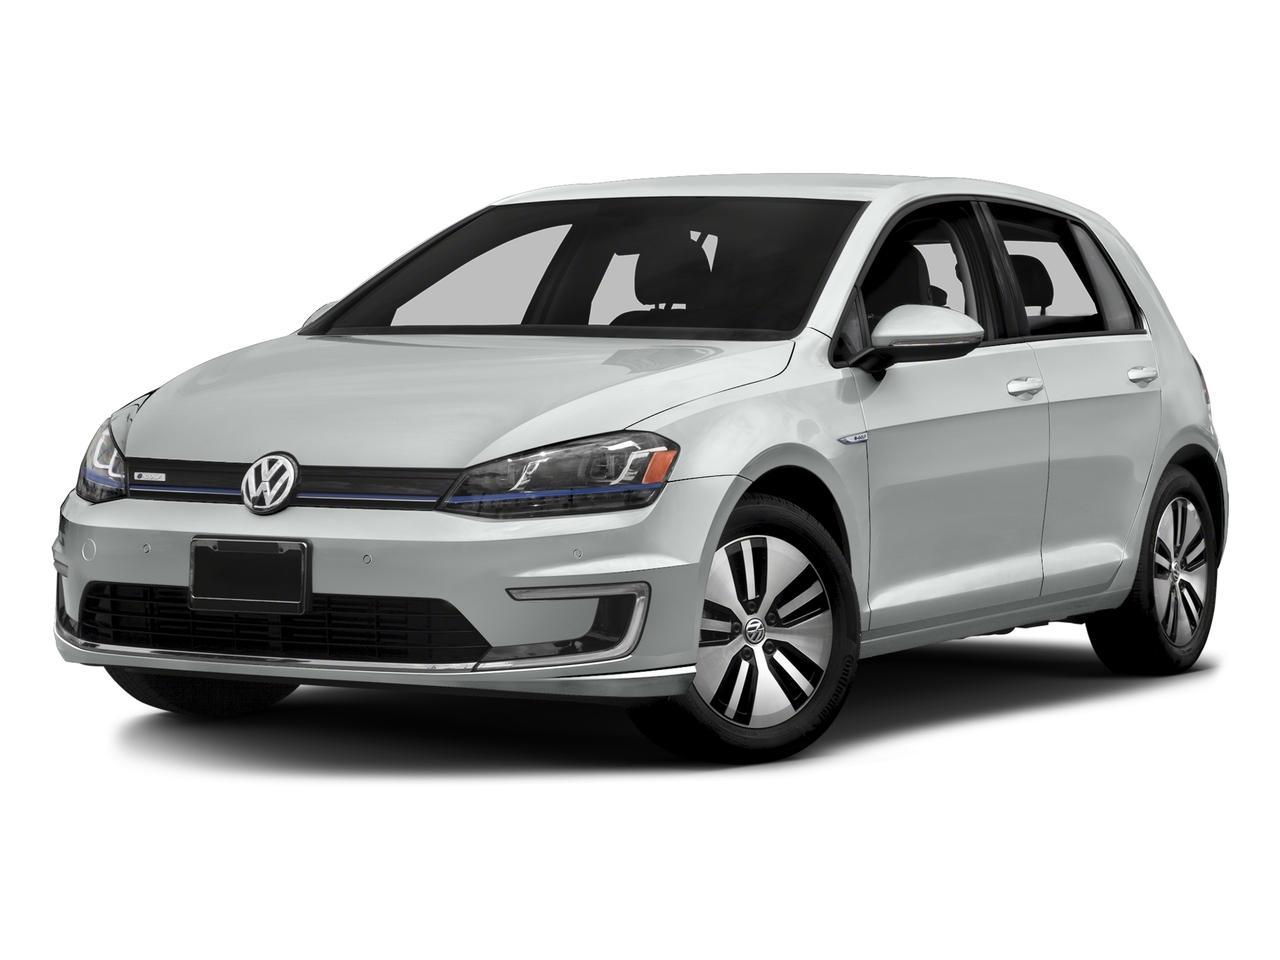 2016 Volkswagen e-Golf Vehicle Photo in Pleasanton, CA 94588